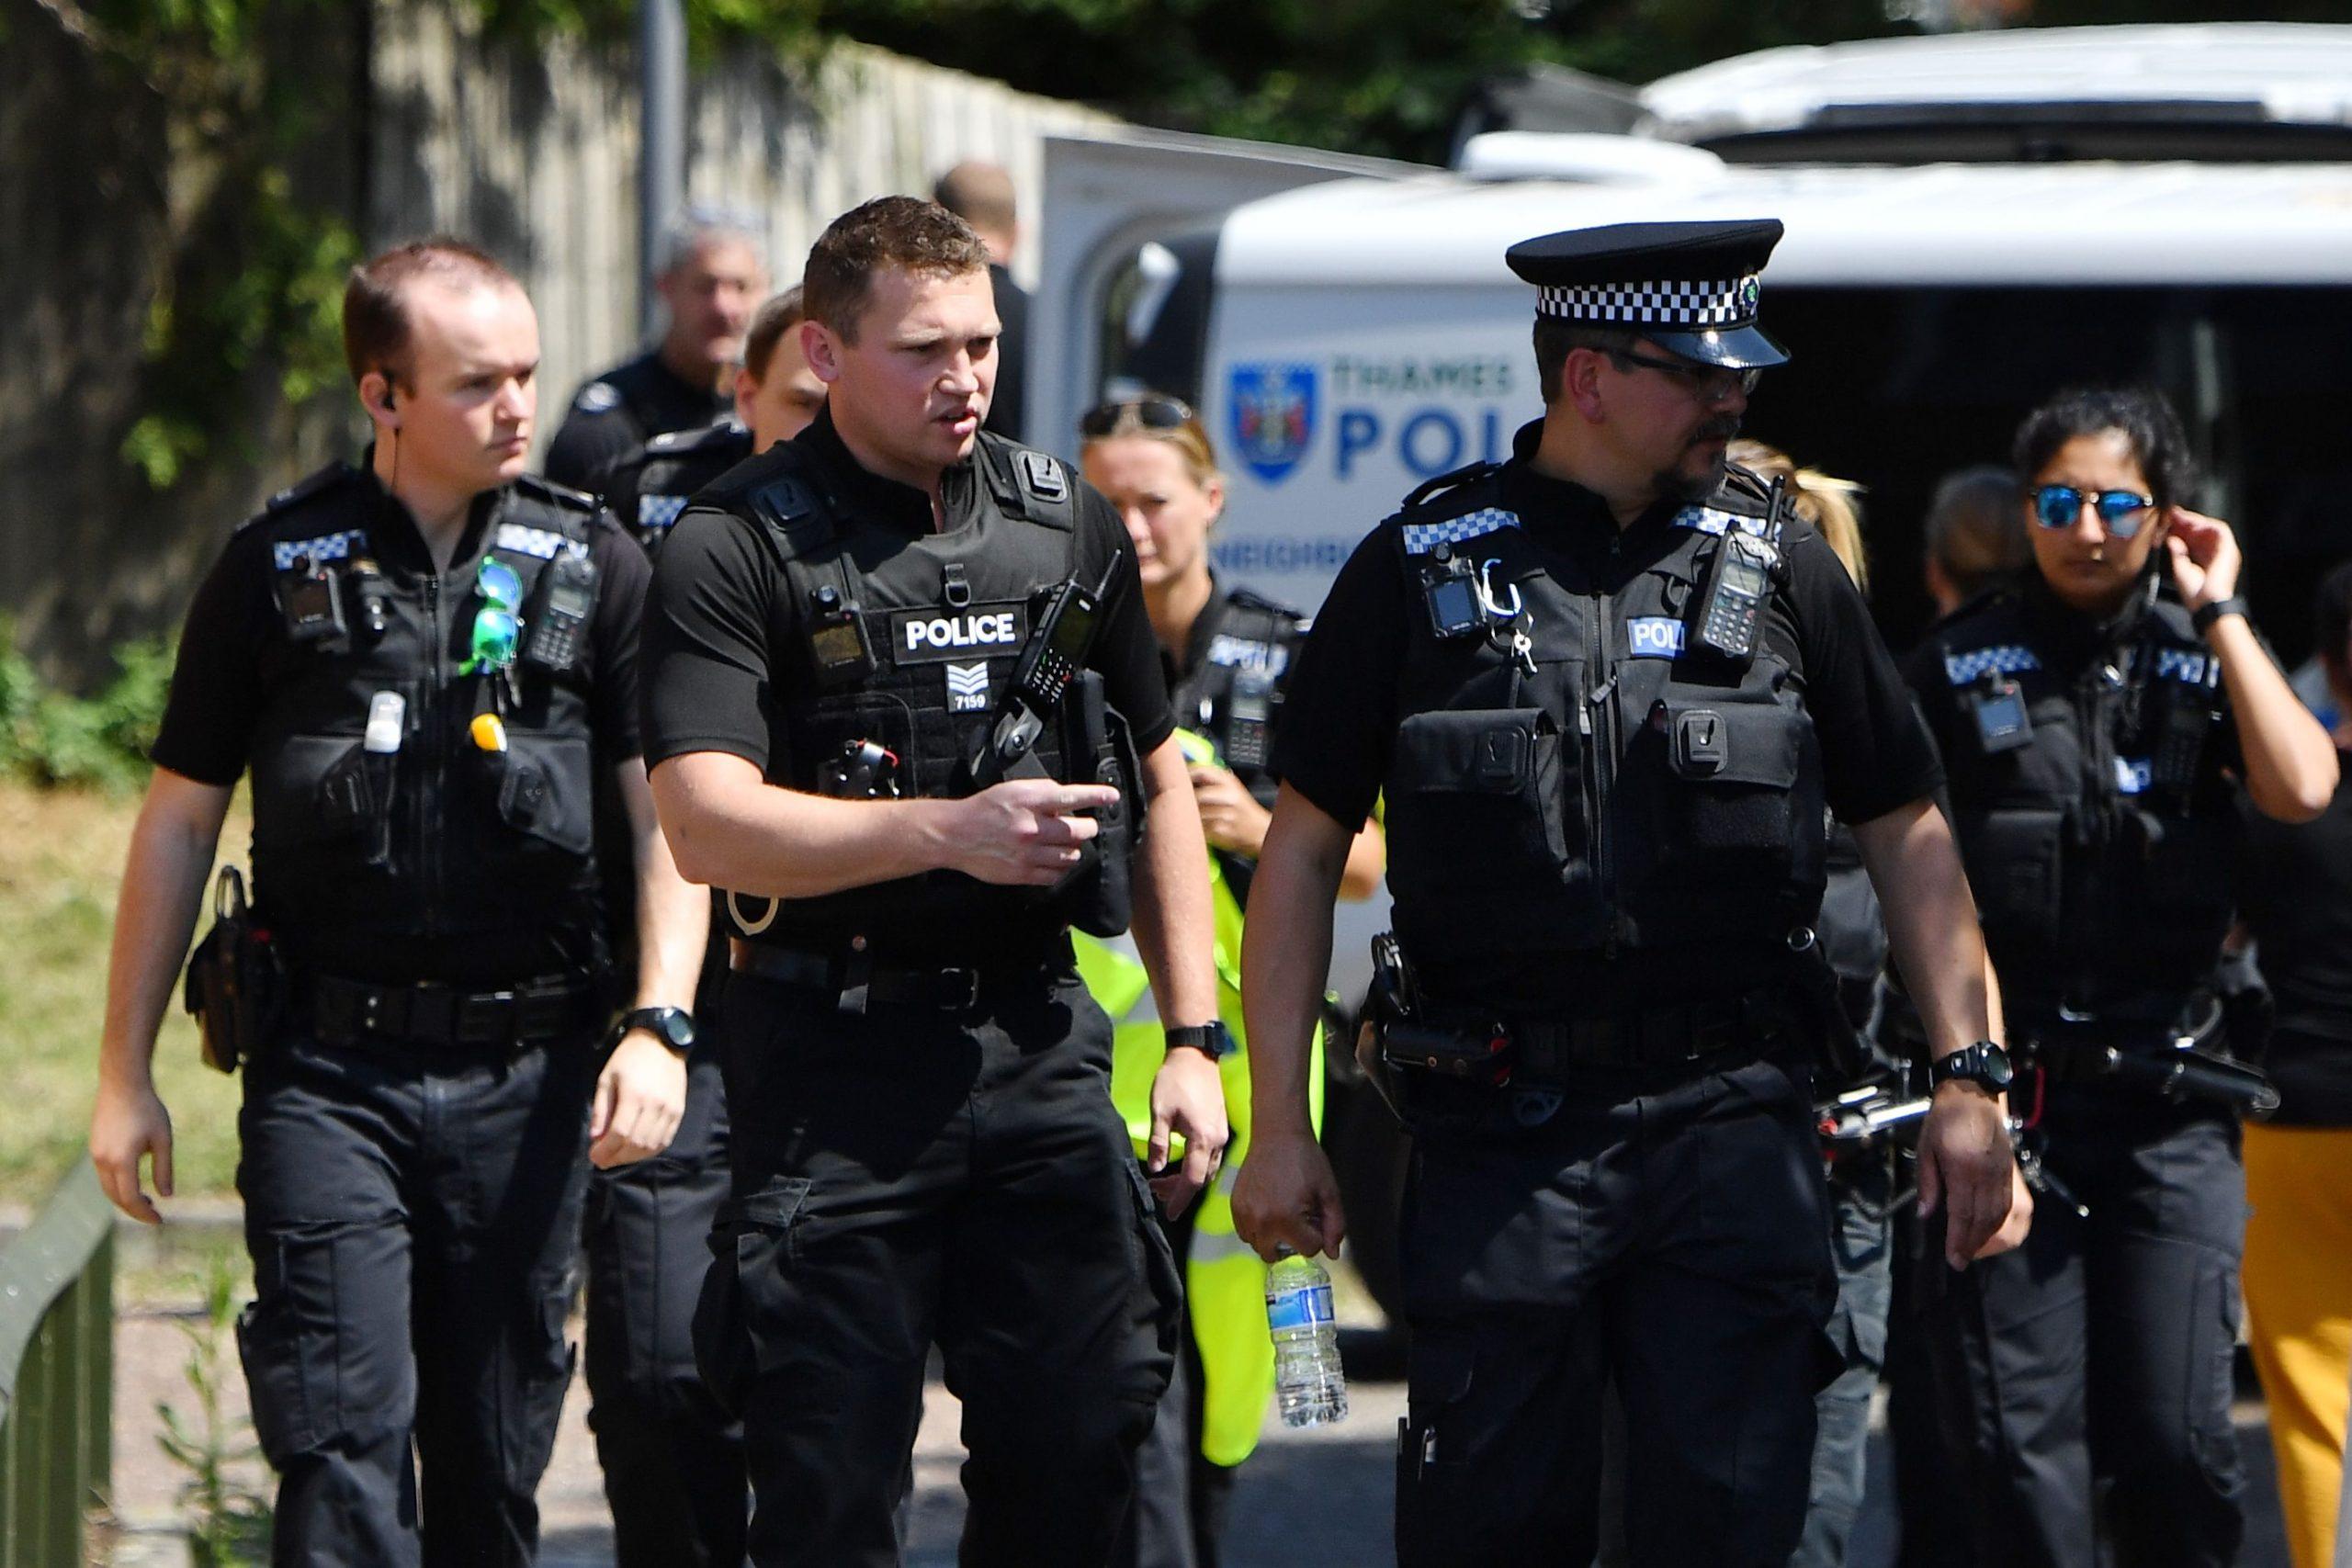 BRITAIN-POLICE-POLITICS-STABBINGS